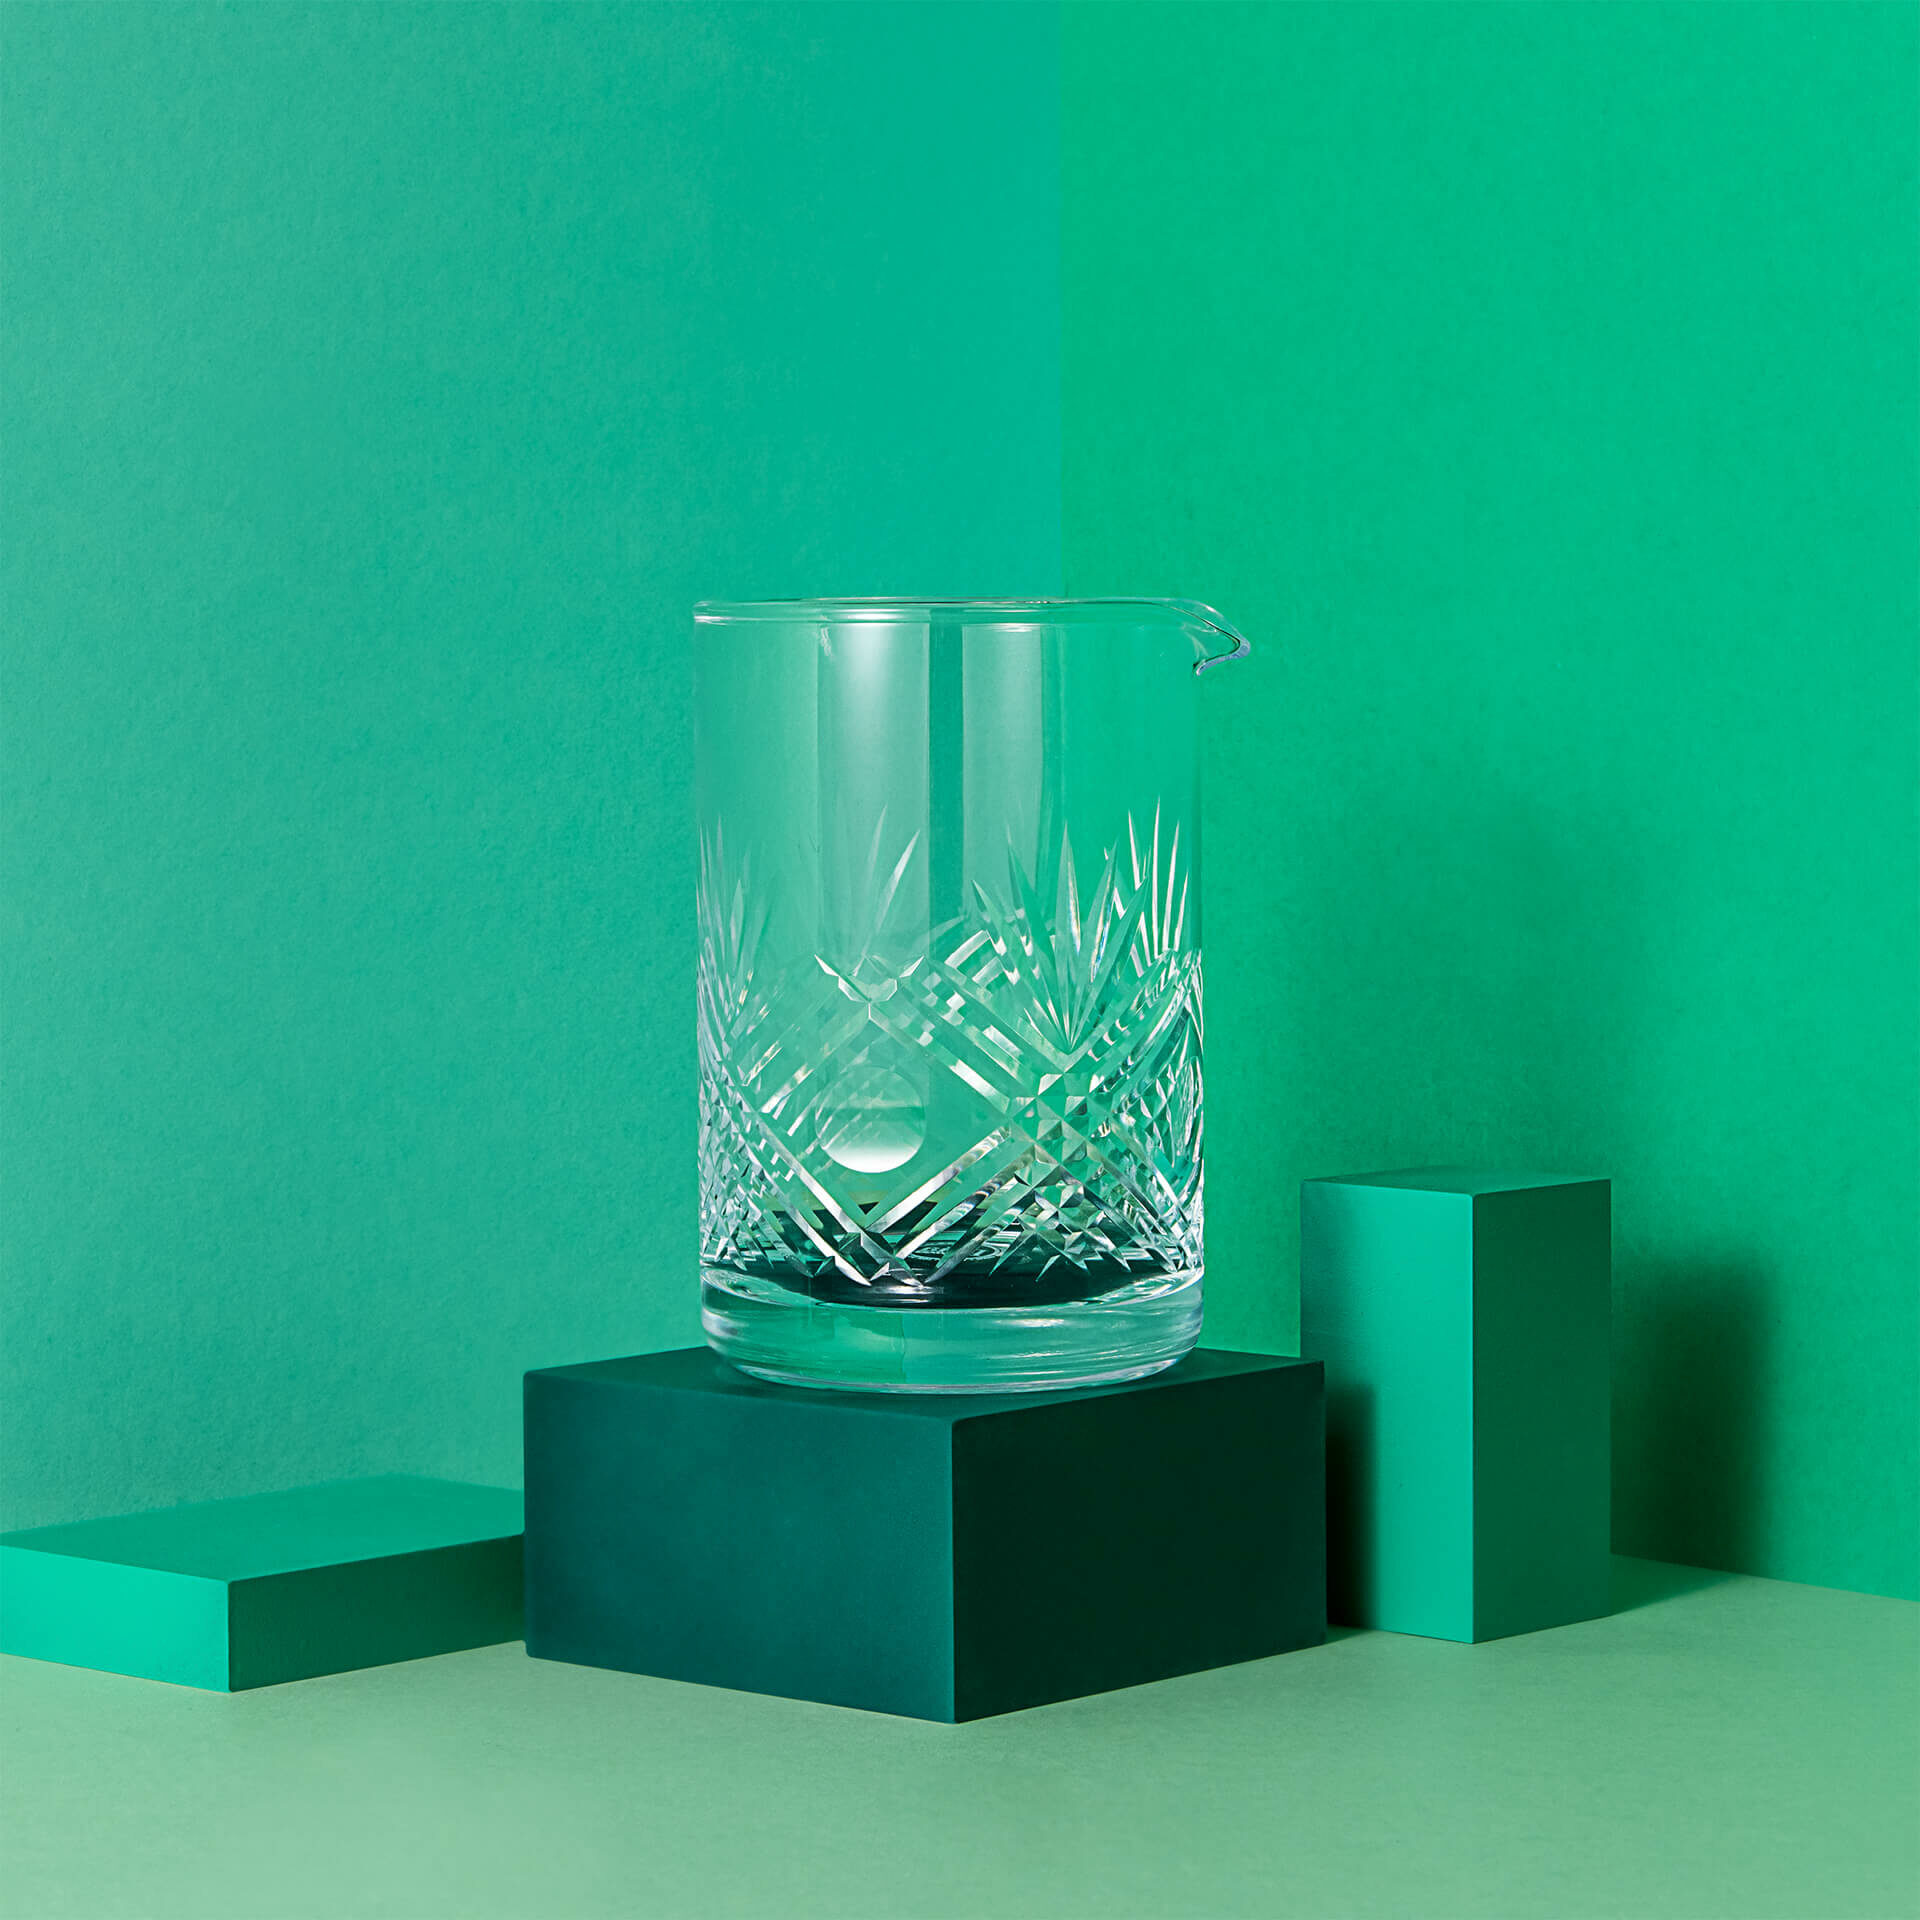 Pina Rührglas Cocktail Mixing Glass - Drink Syndikat